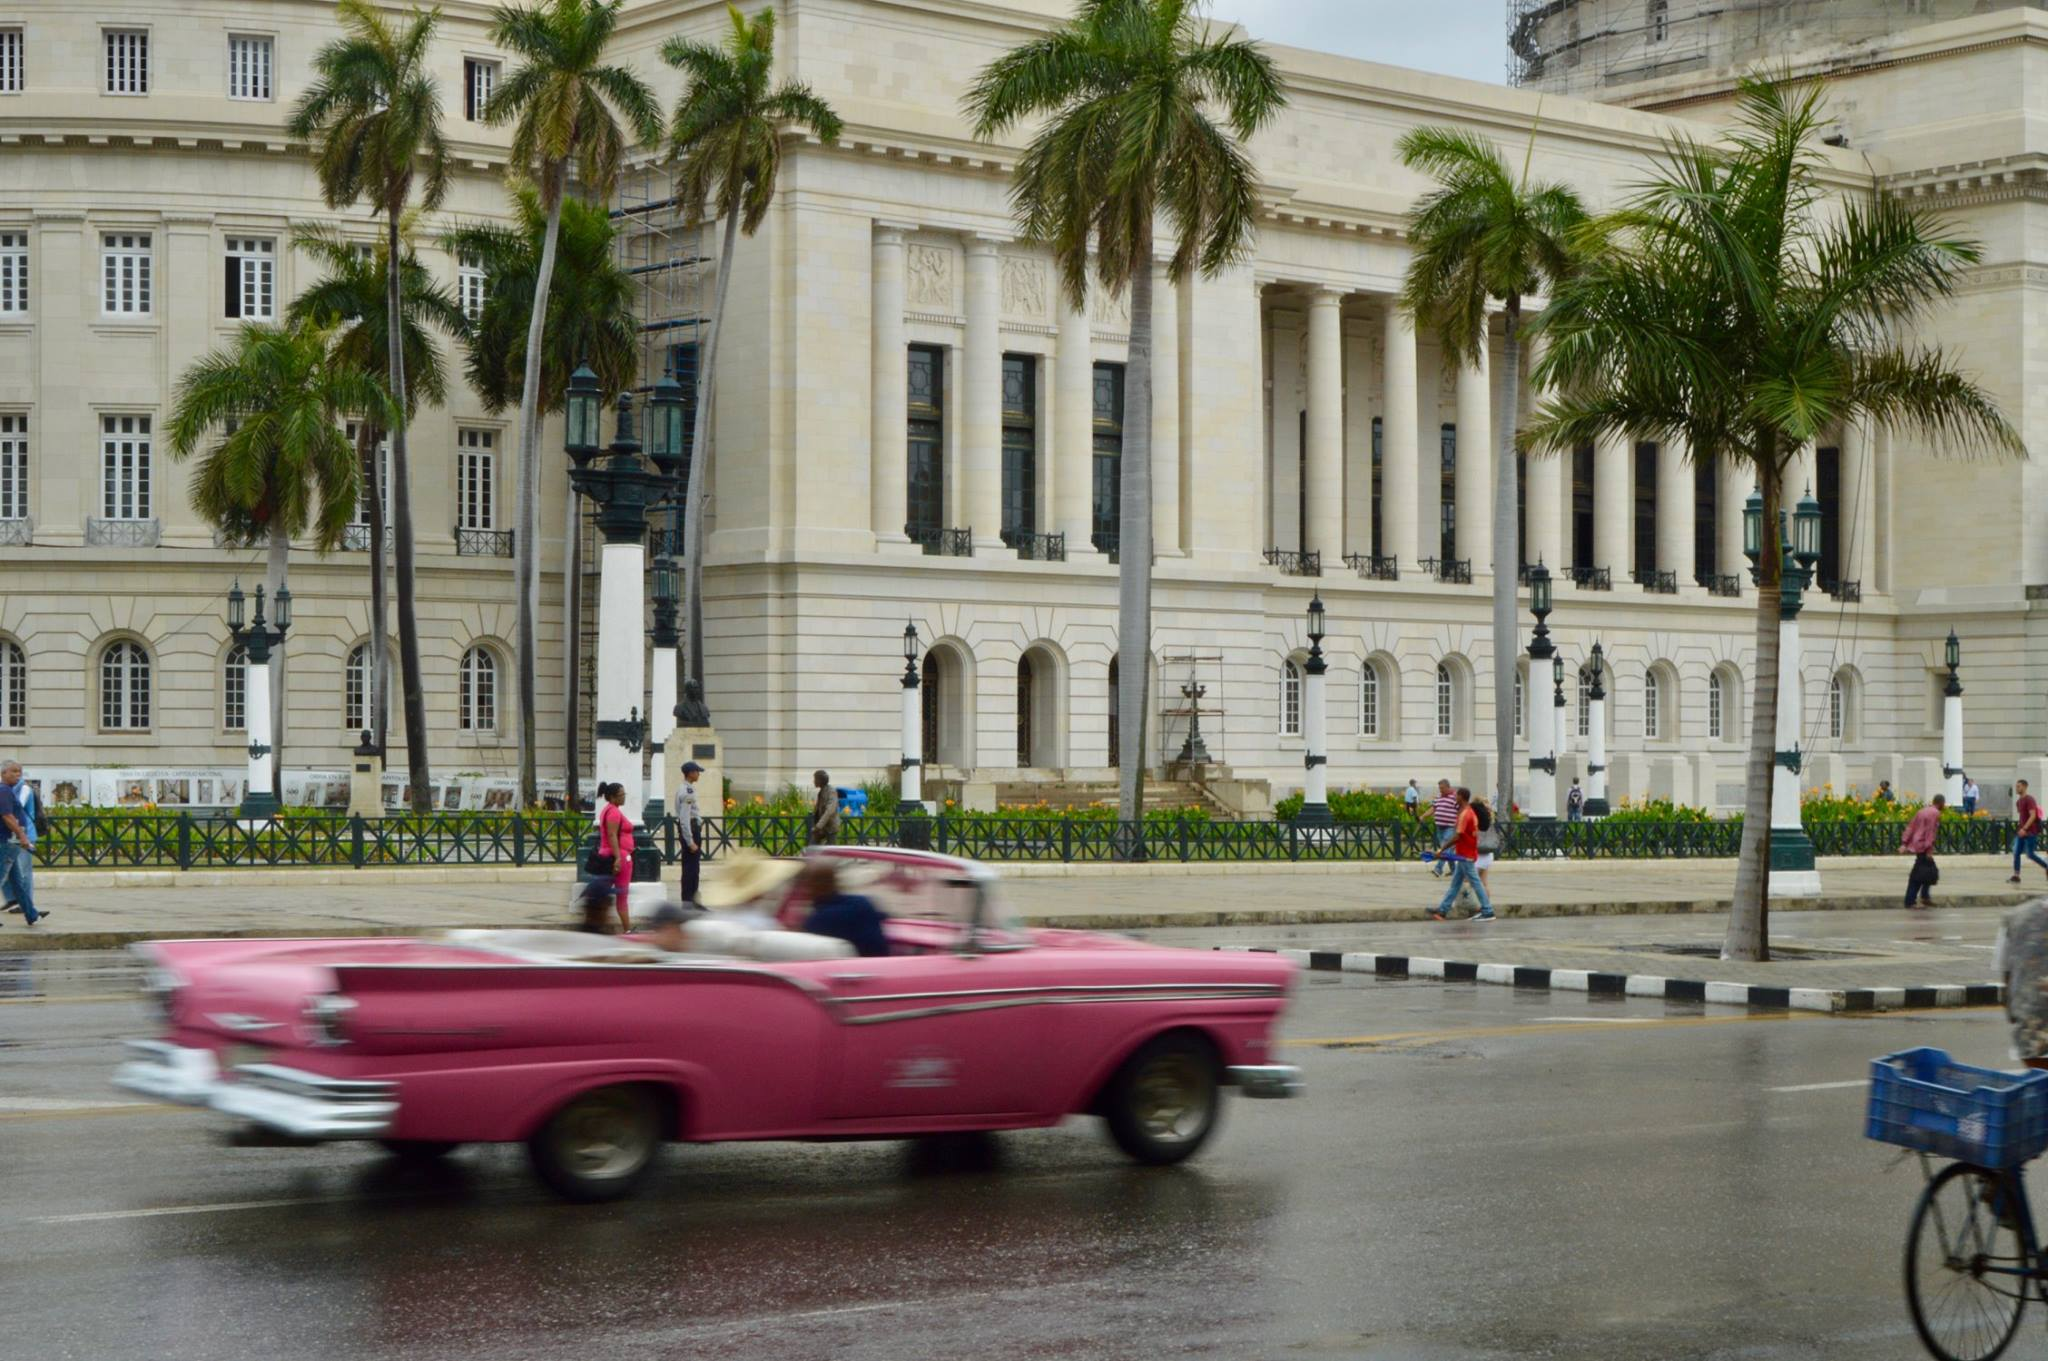 Havanataxi1.jpg